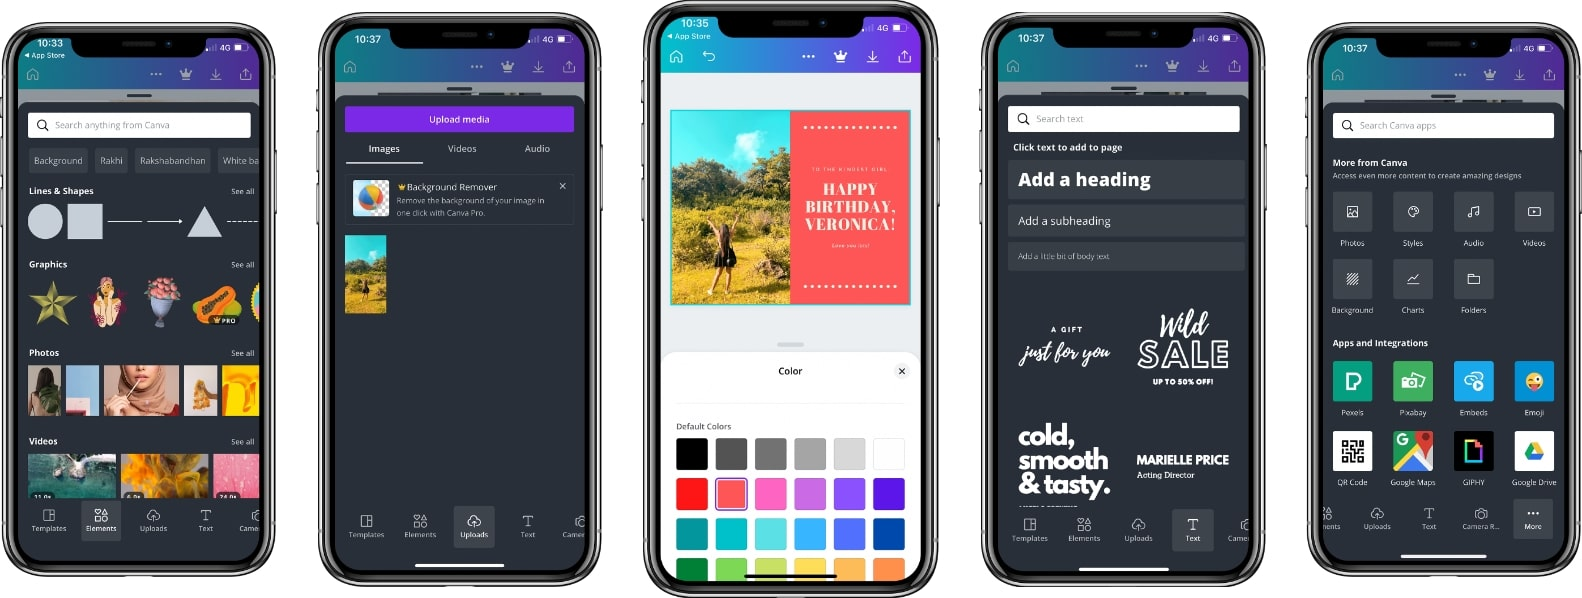 screenshot of the canva mobile app